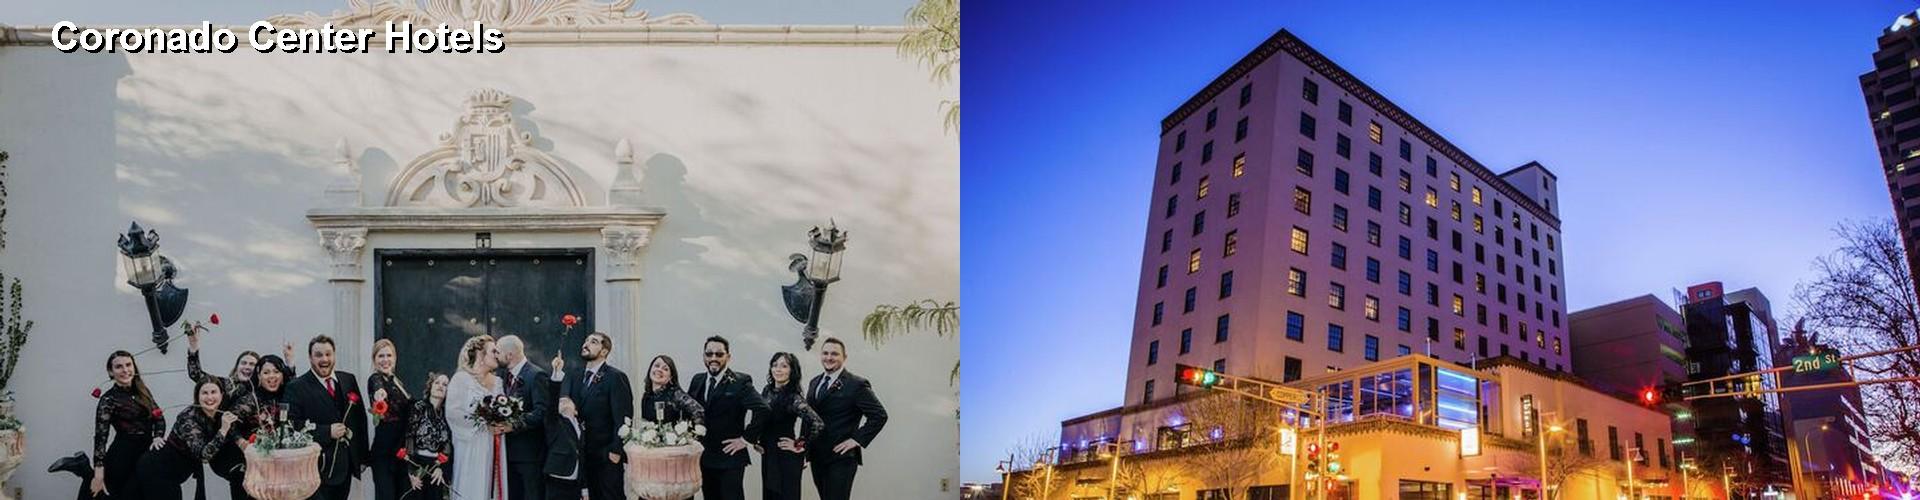 5 Best Hotels Near Coronado Center